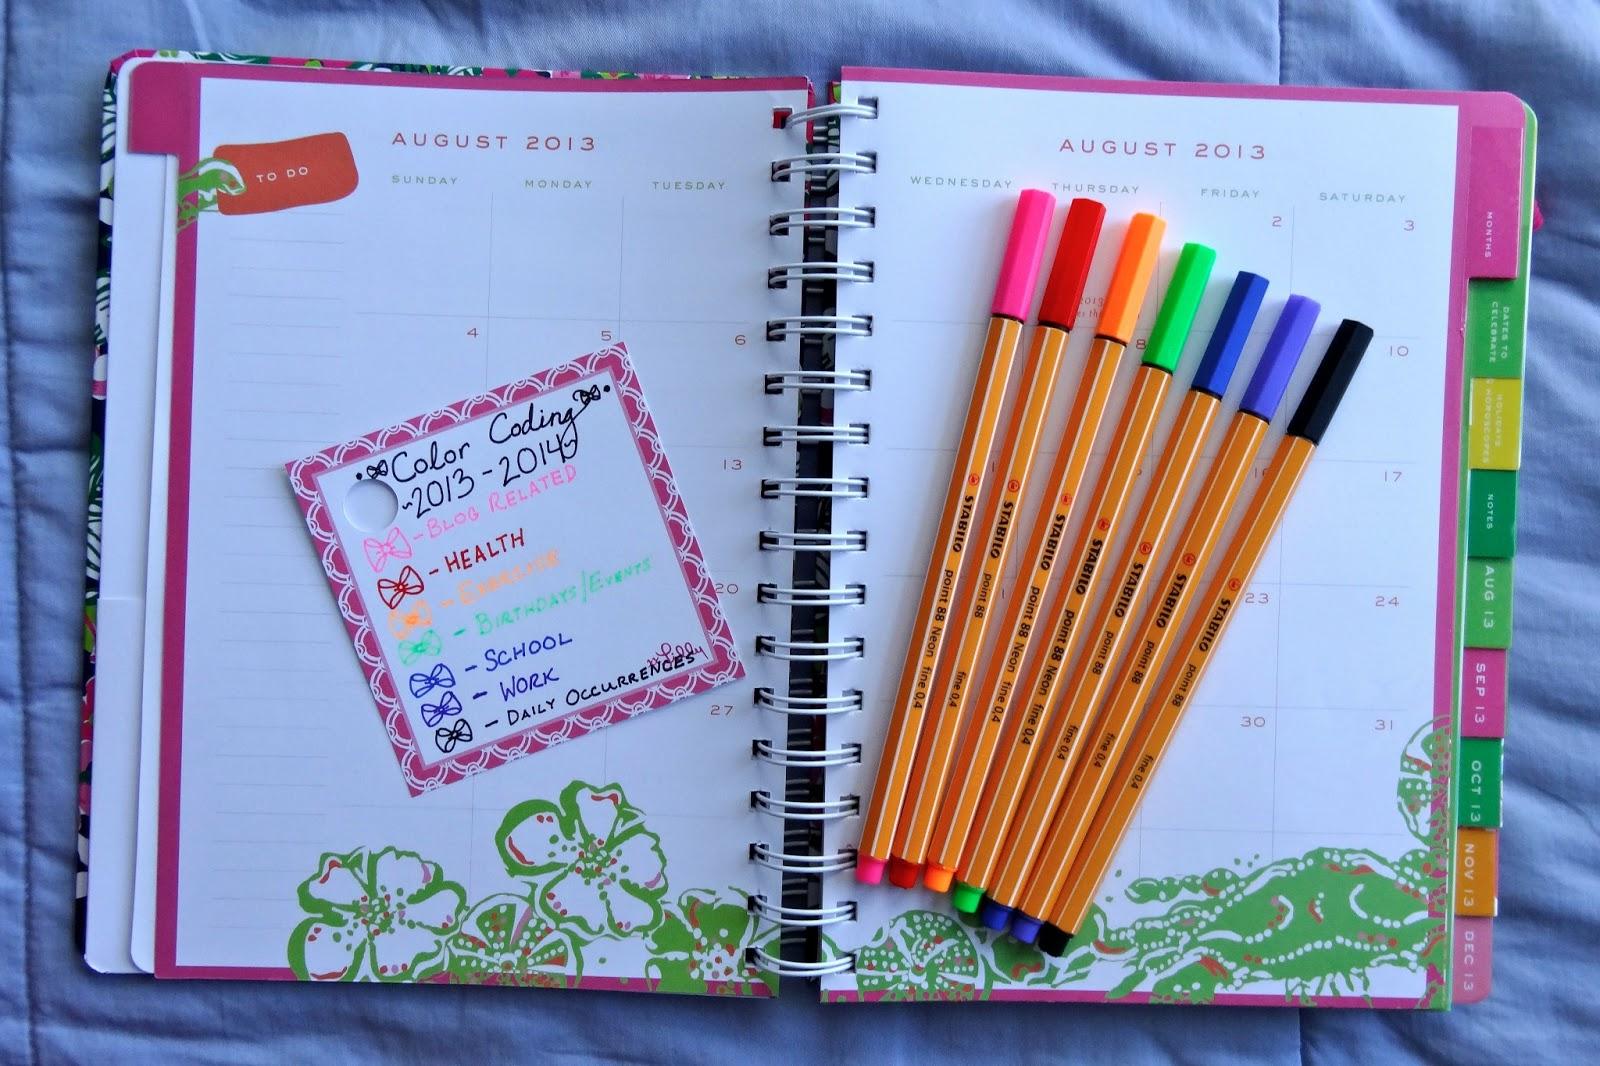 Html Calendar Planner Code : How i organize my lilly agenda bowtiful life